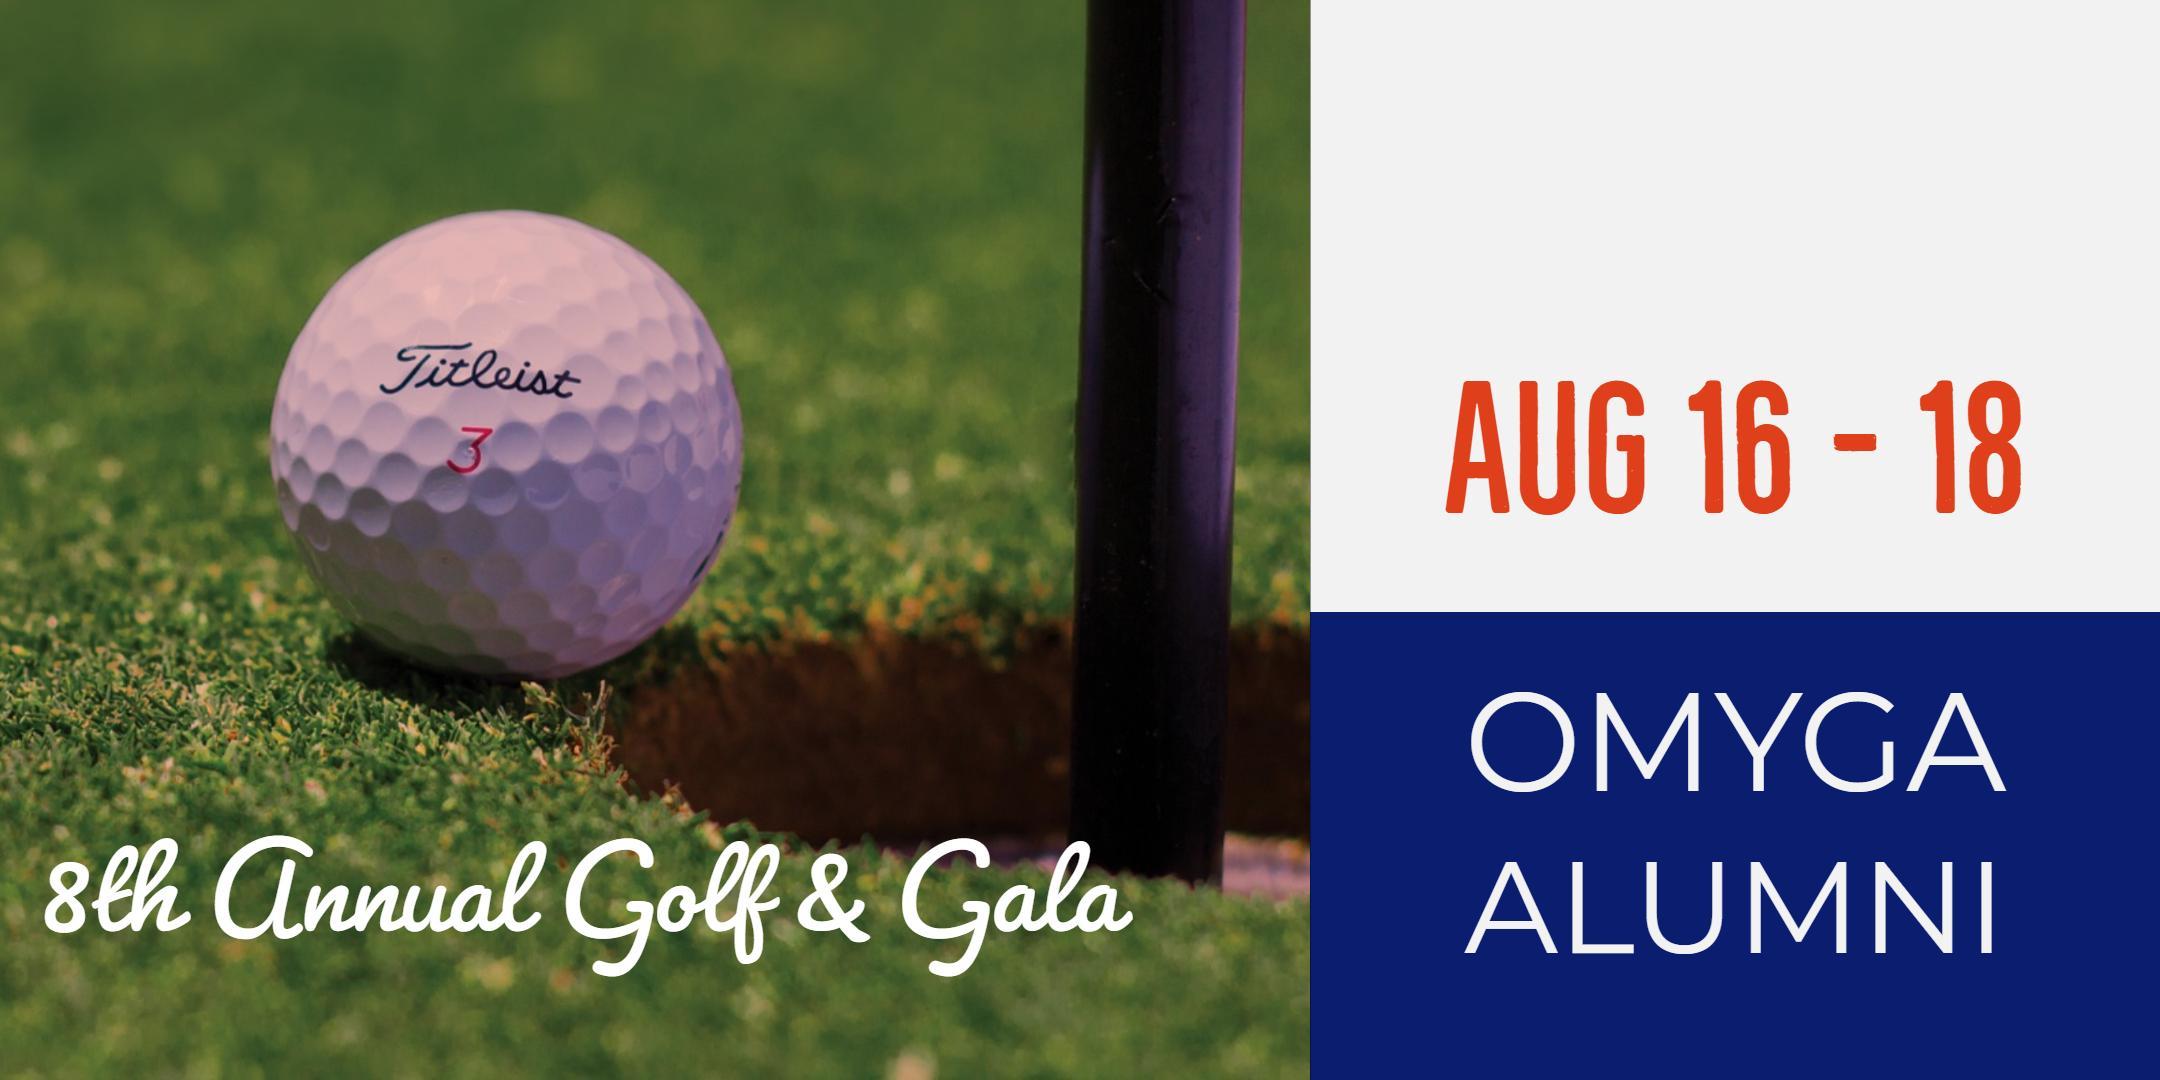 The 9th Annual OMYGA Alumni Golf & Gala Event